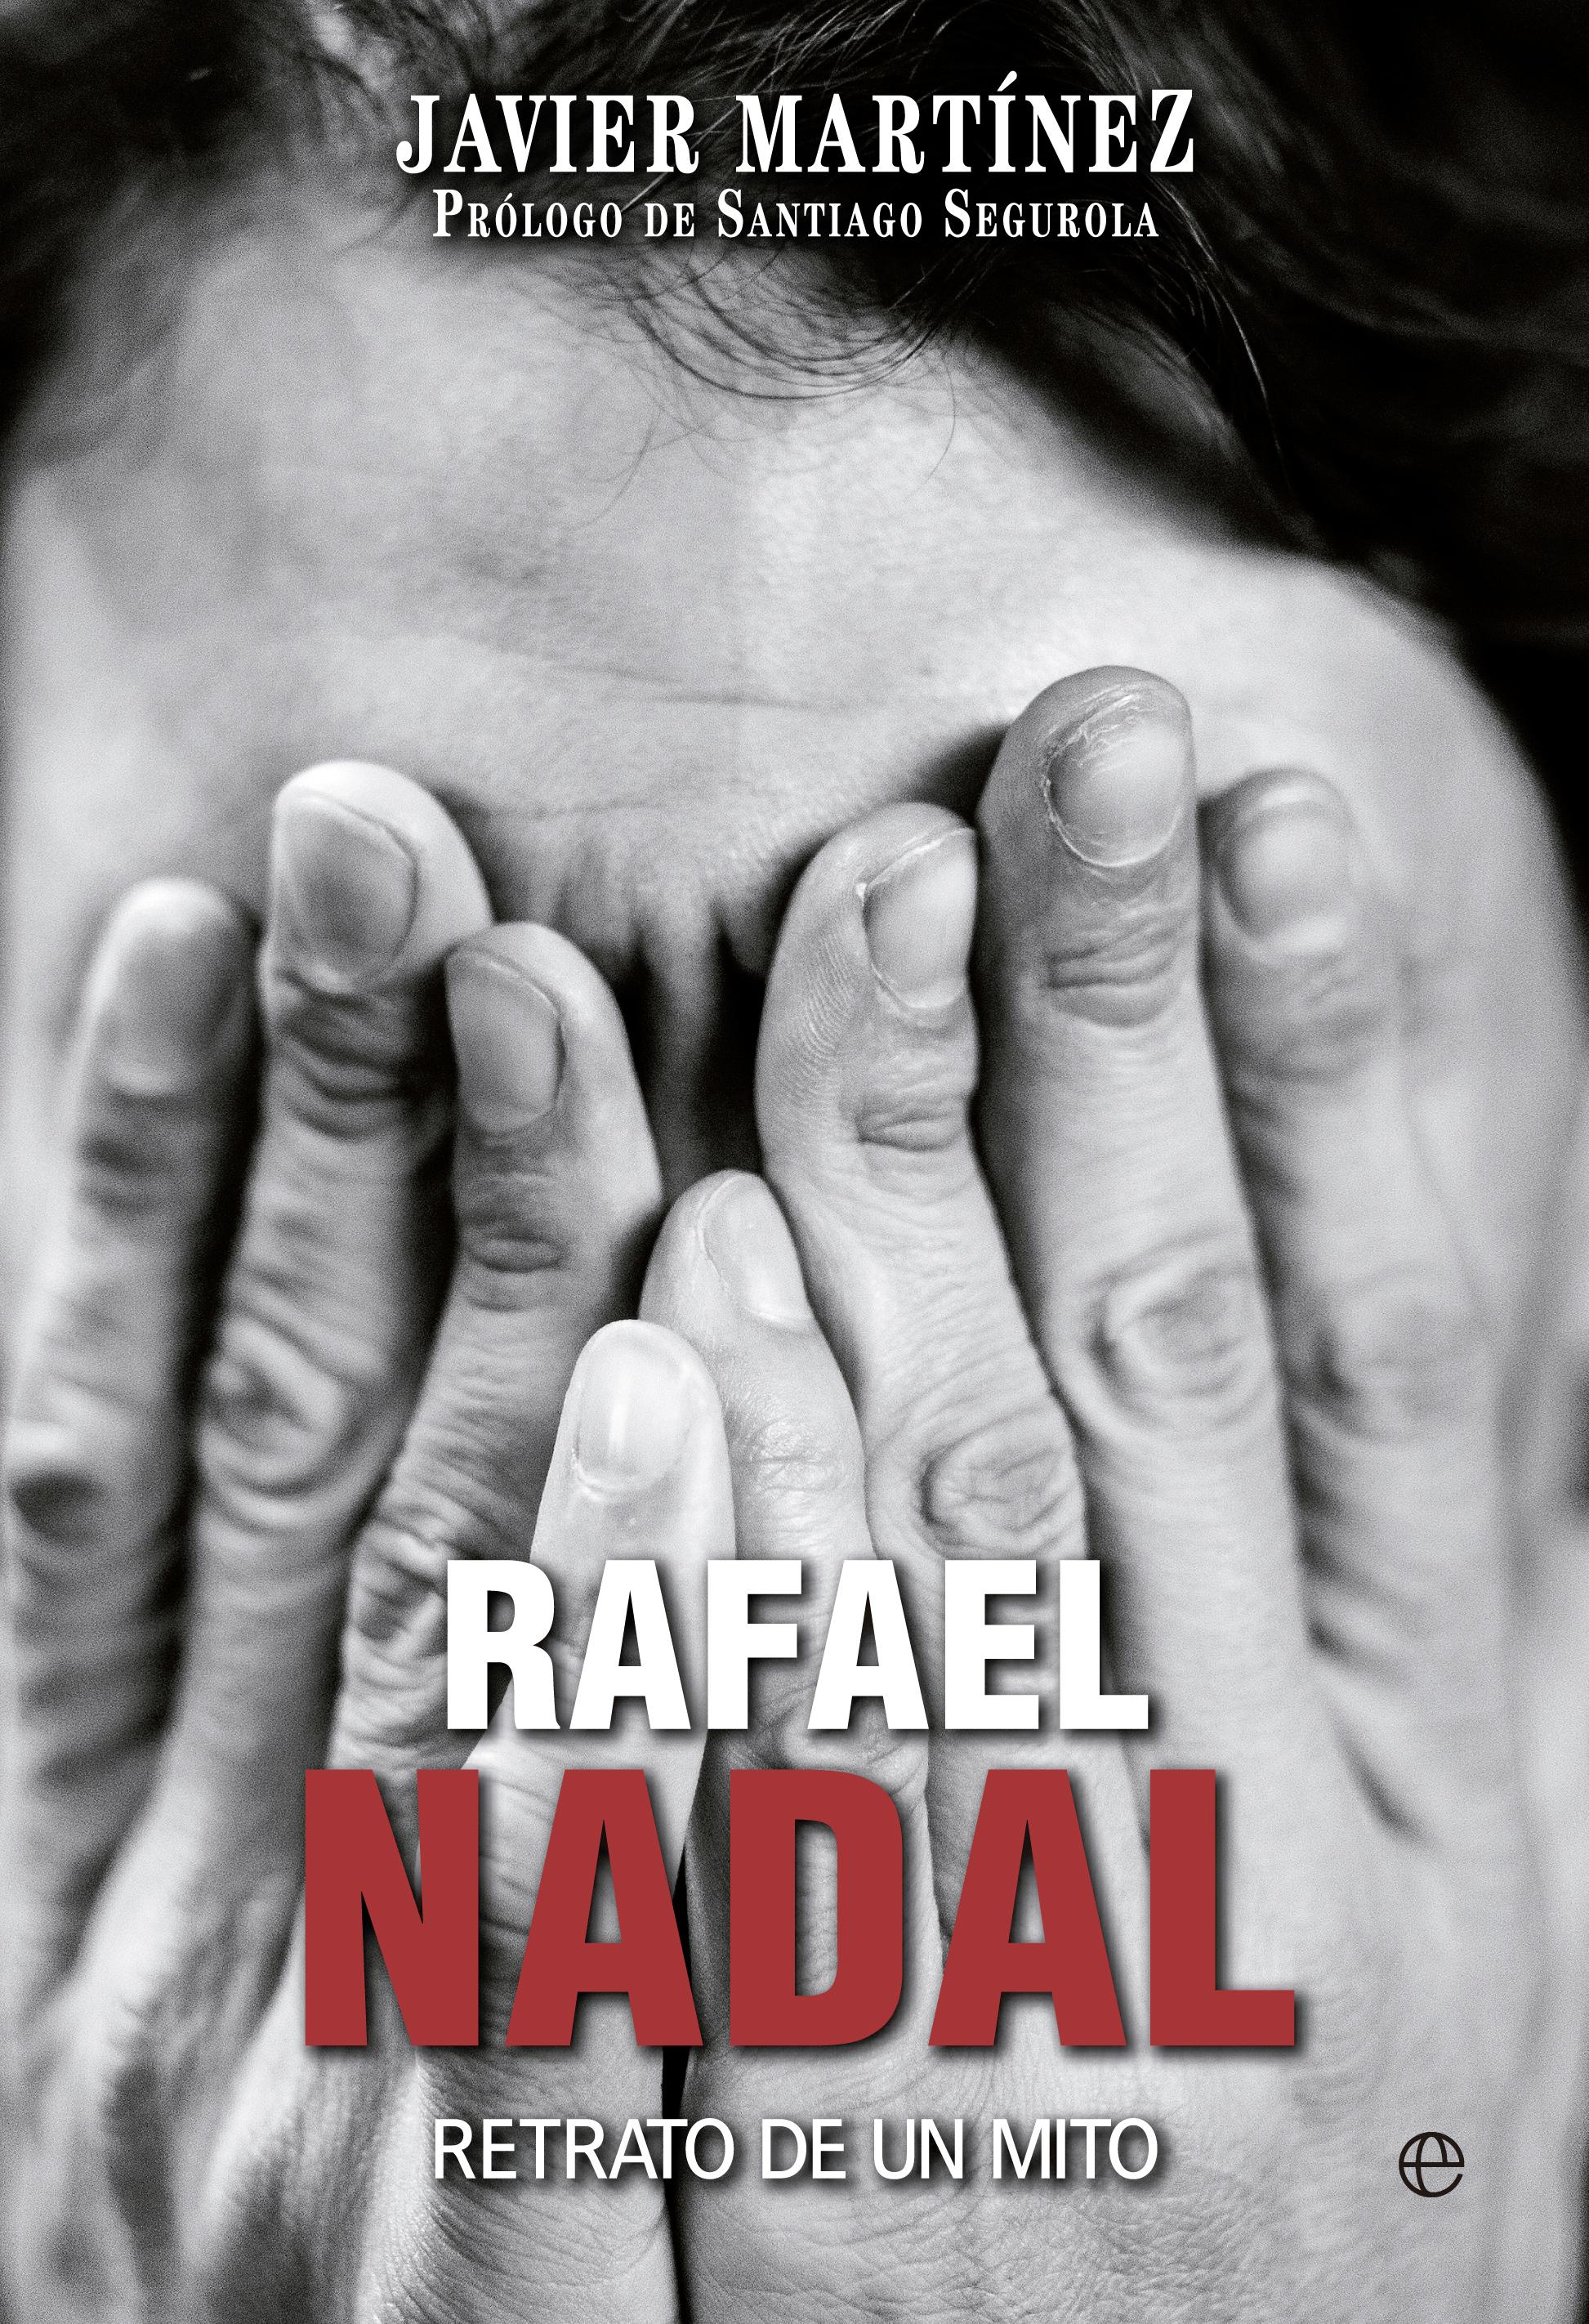 RAFAEL NADAL. RETRATO DE UN MITO